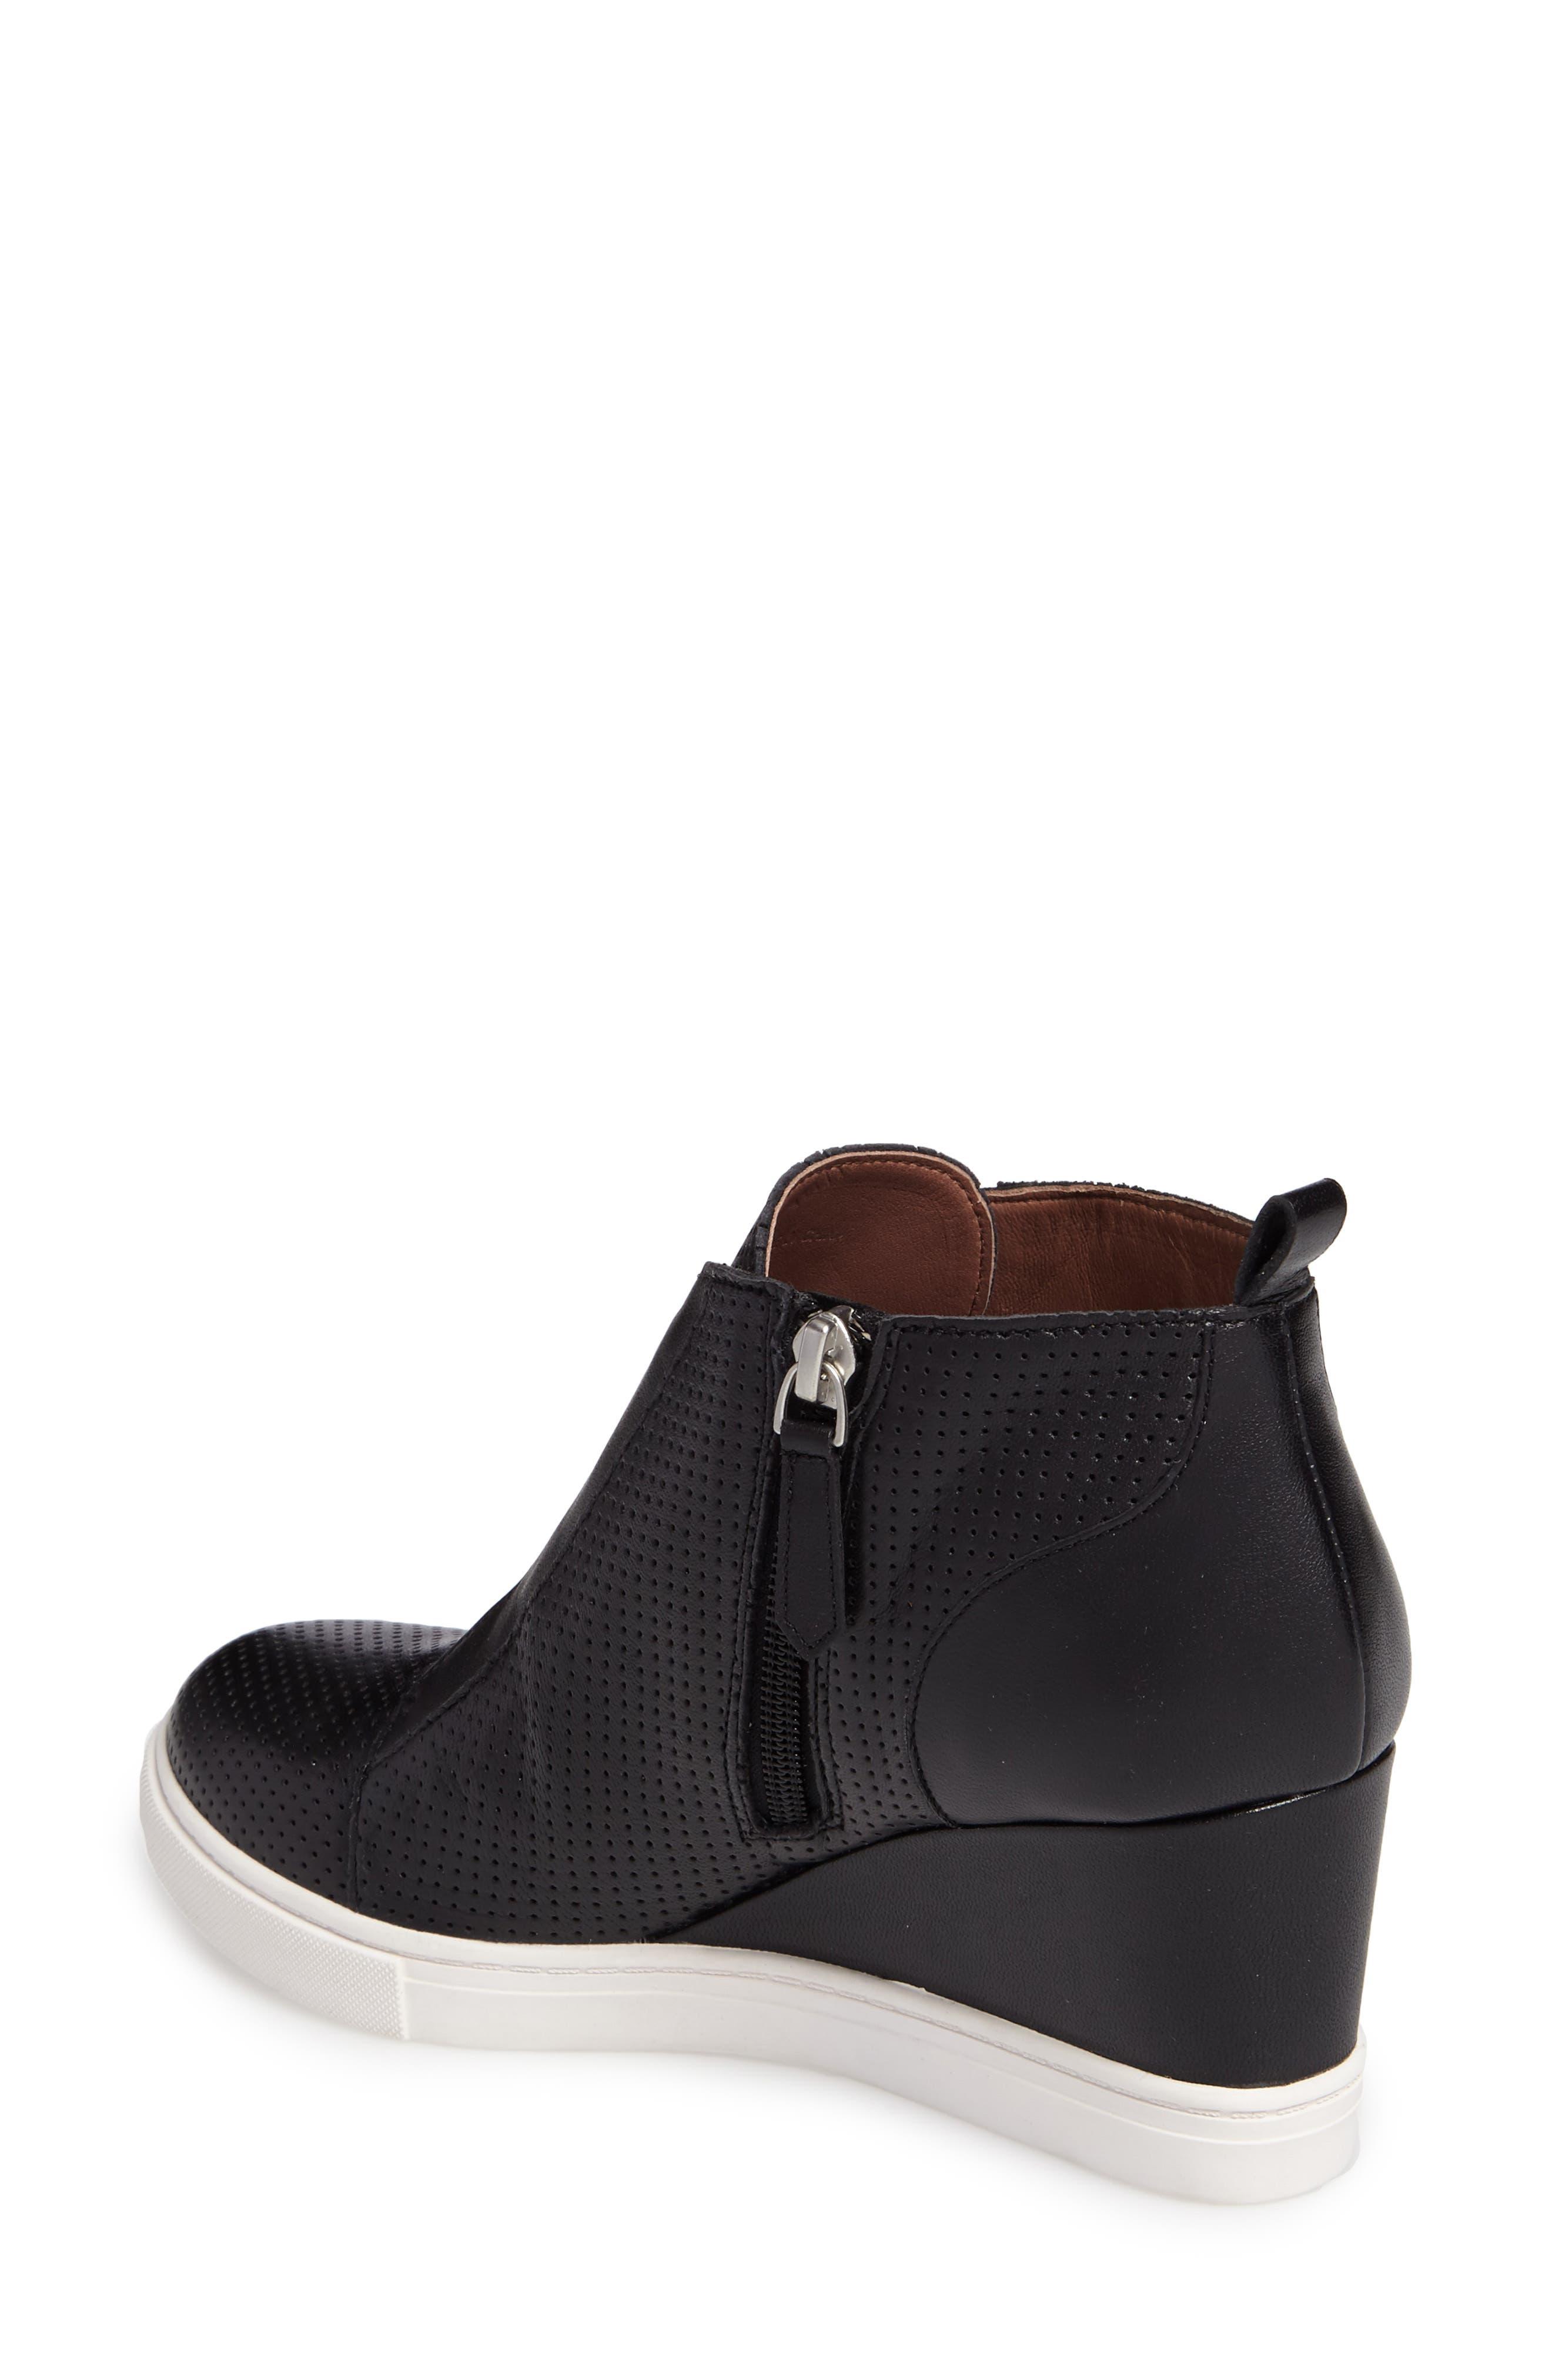 9eadc7c7da0 Women s Linea Paolo Shoes